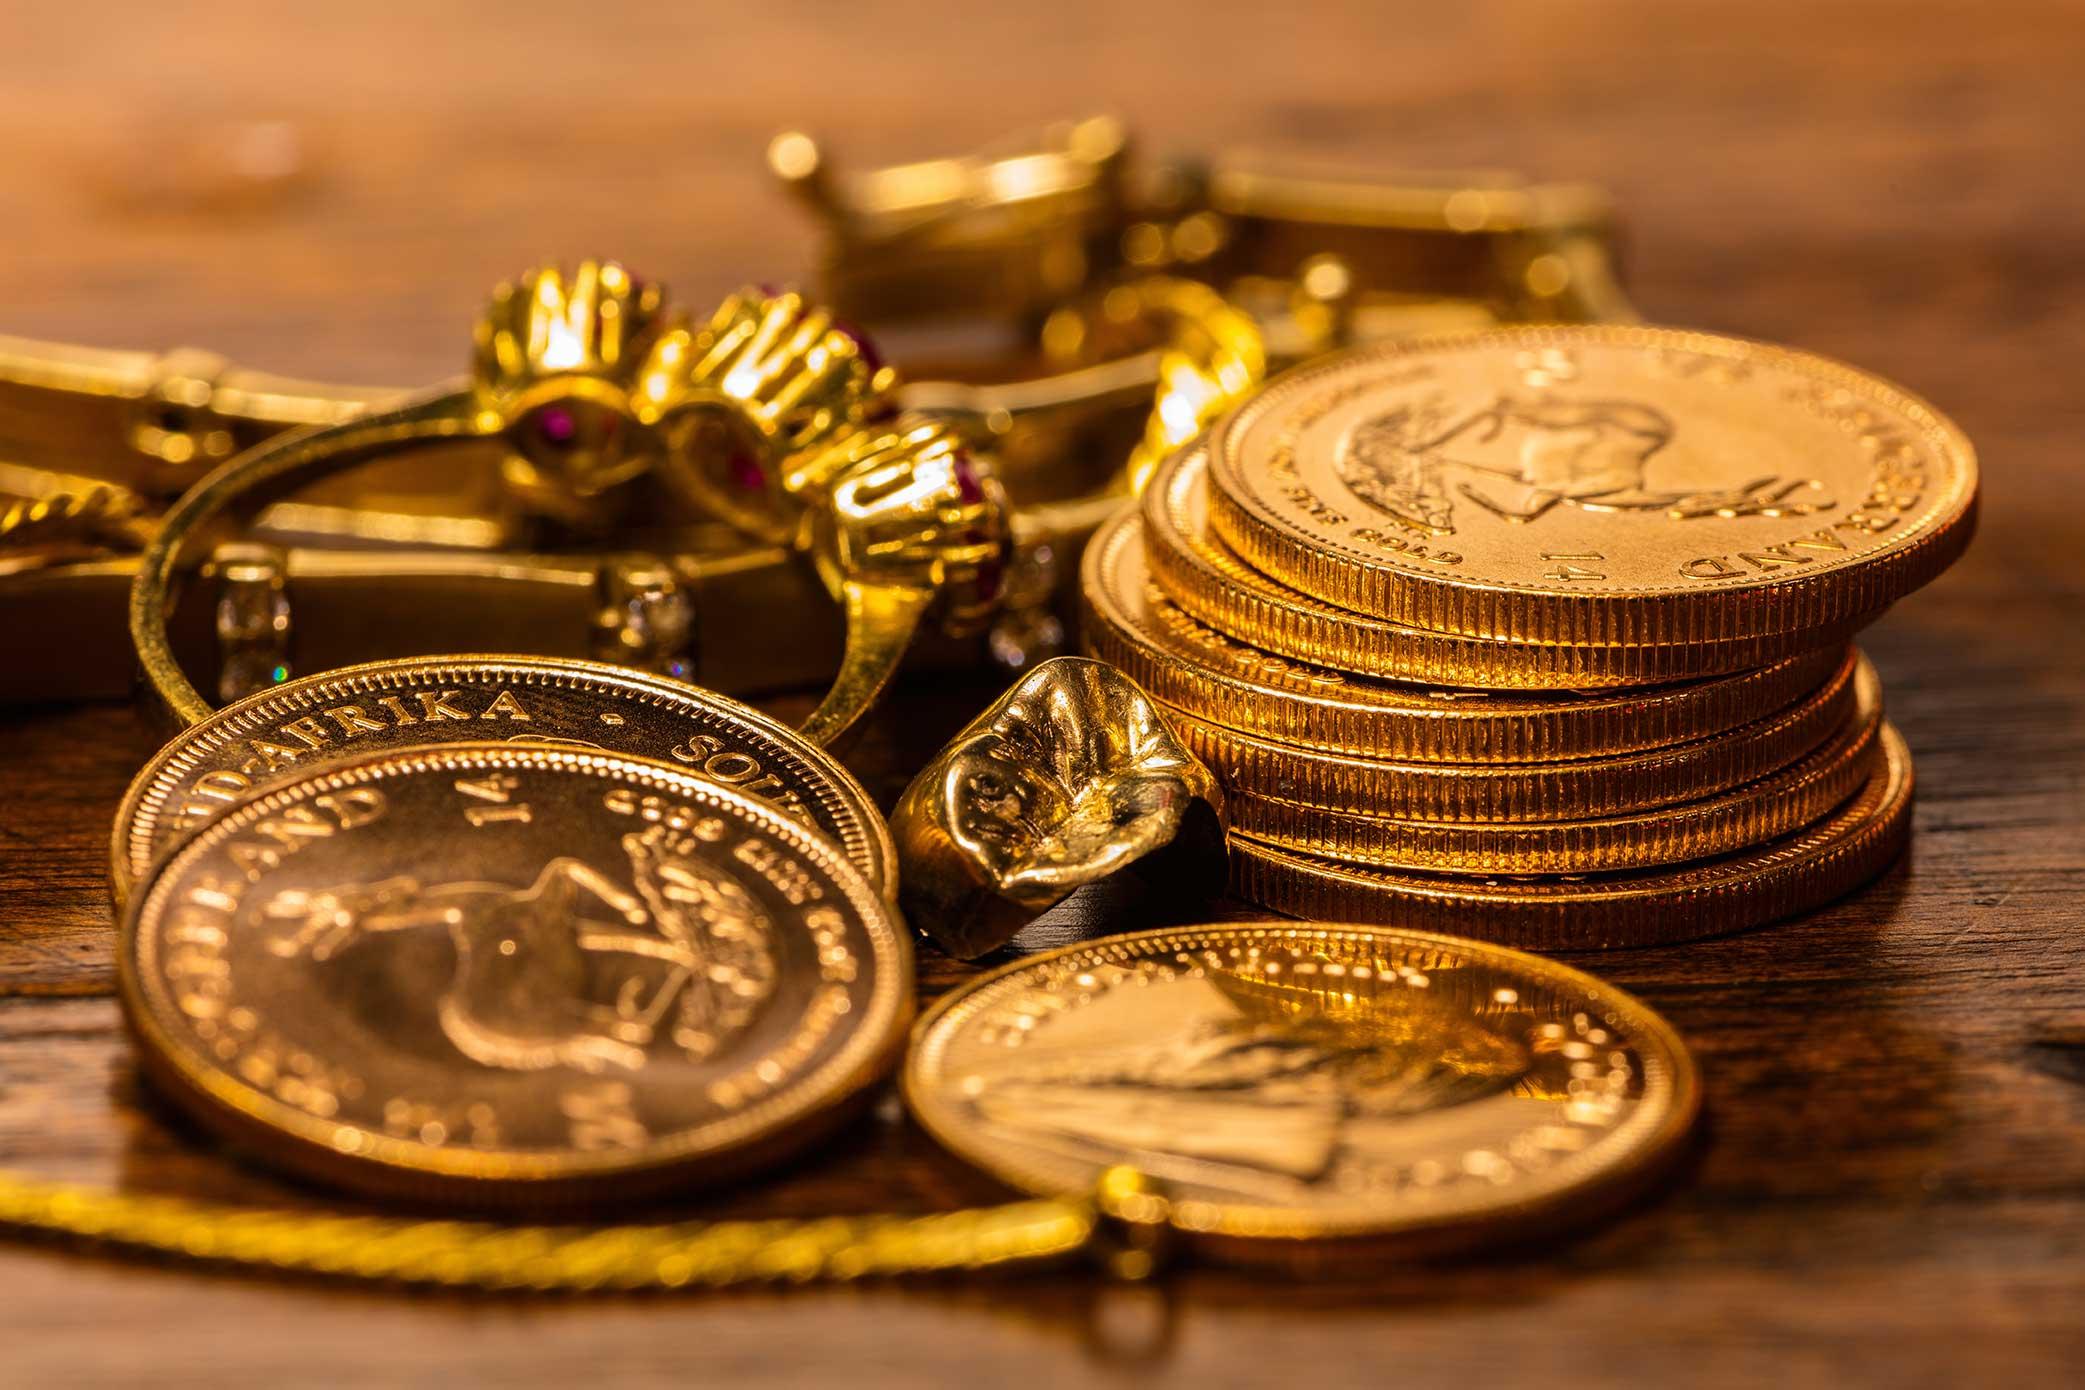 monedas oro en Bilbao